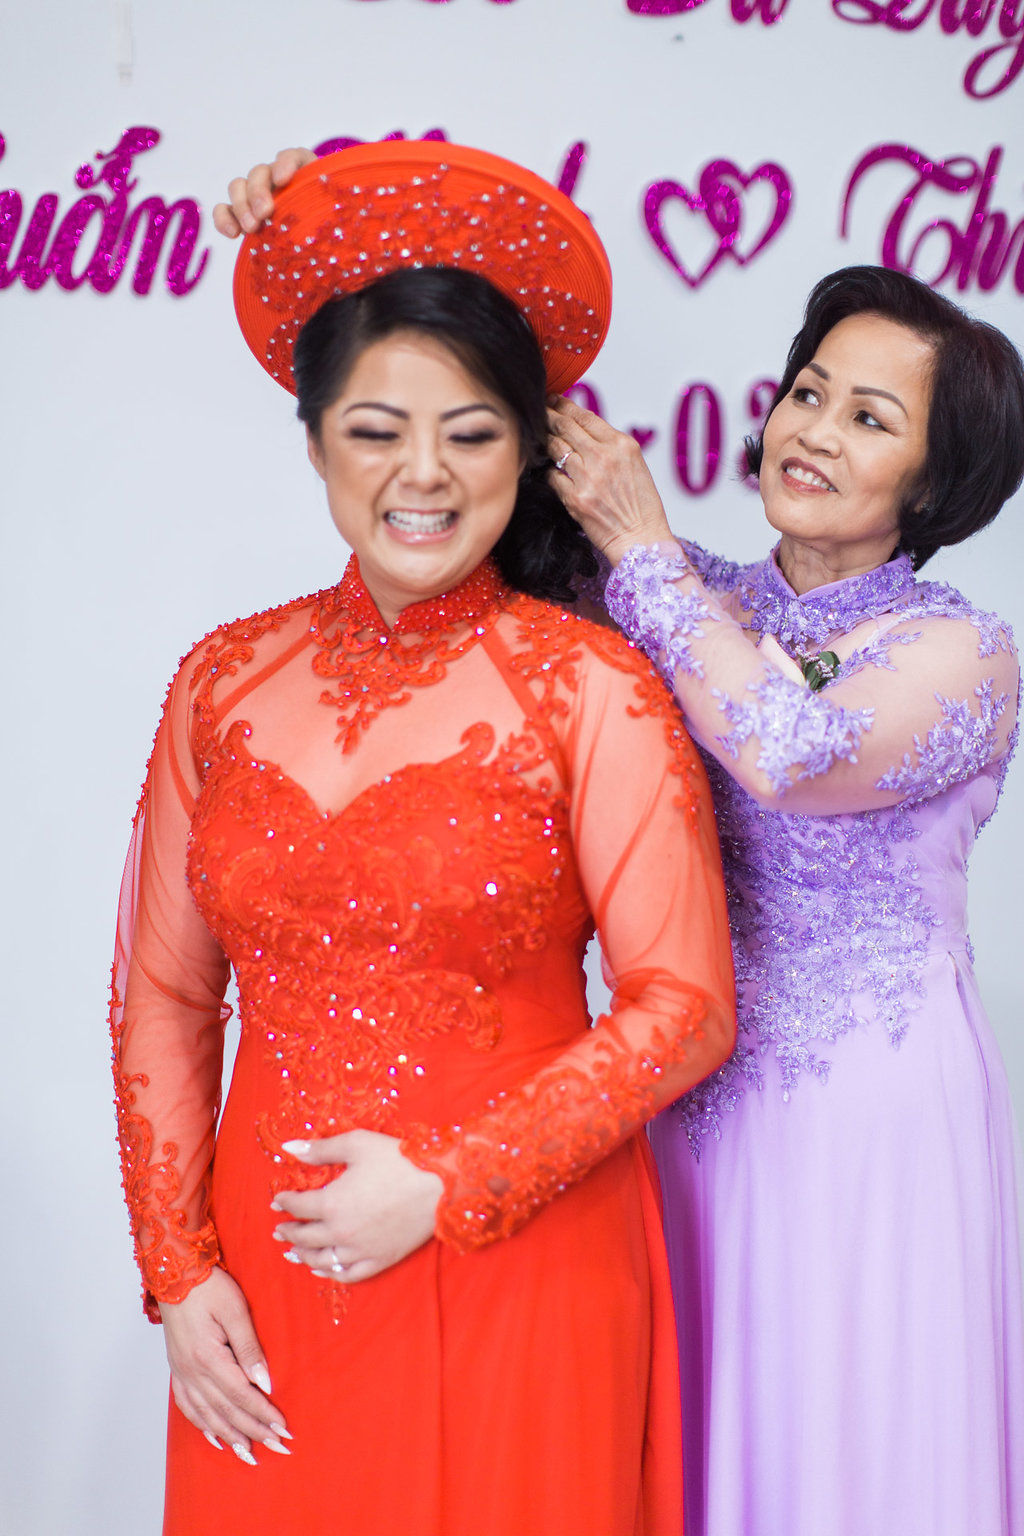 Linh and Kiet Photo 3